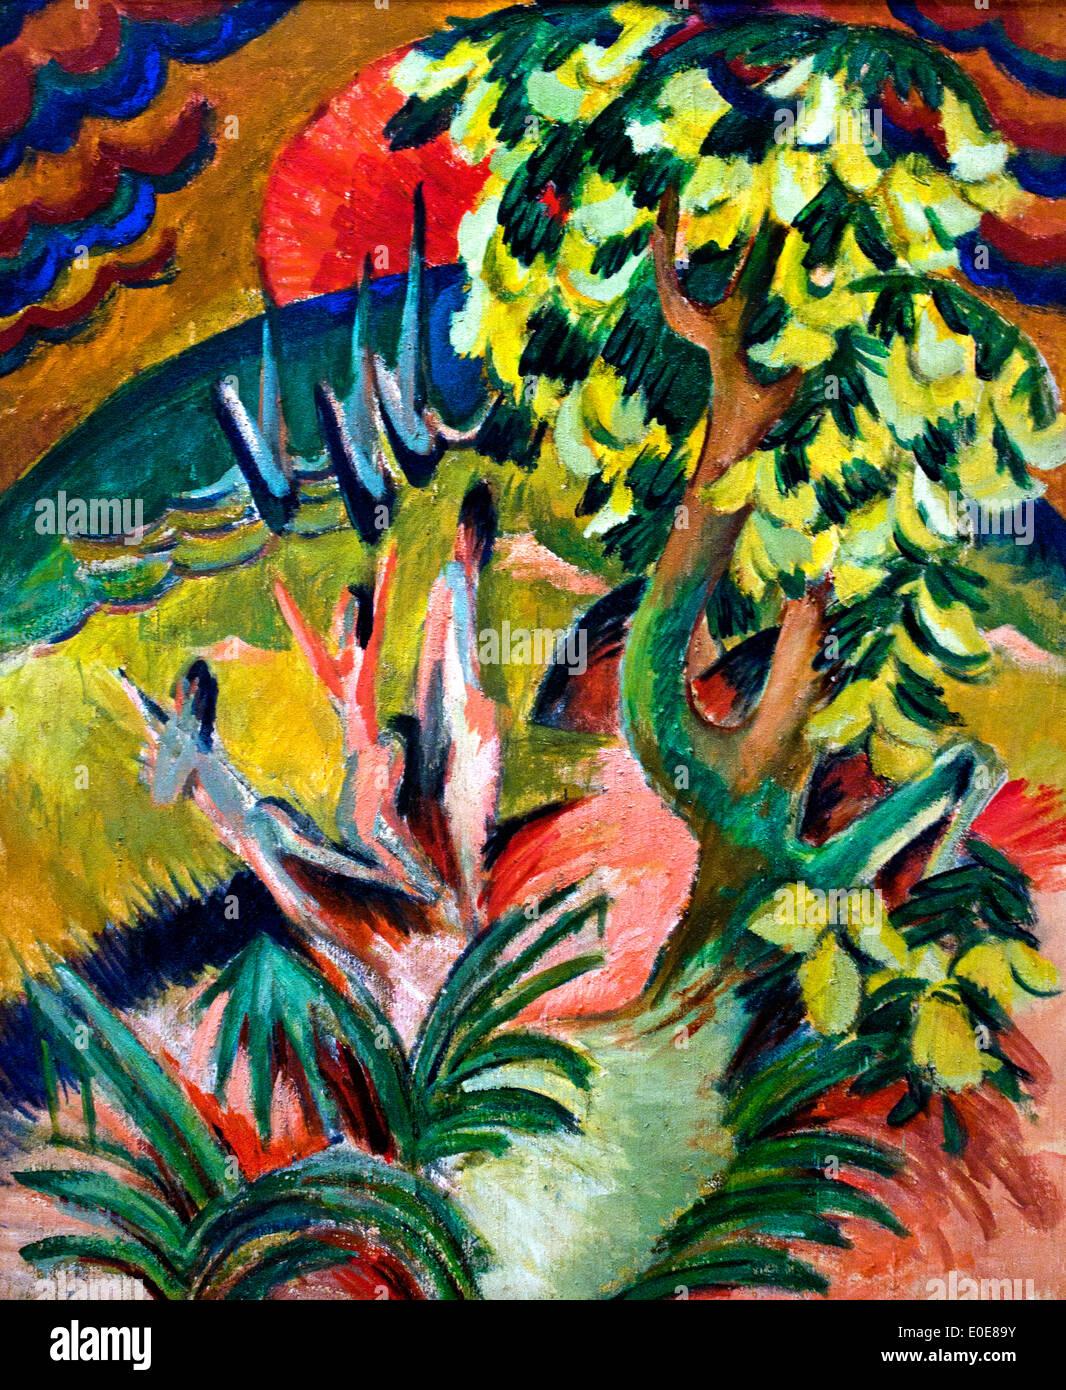 Curving Bay ca. 1914 Ernst Ludwig Kirchner 1880-1938 German Germany - Stock Image